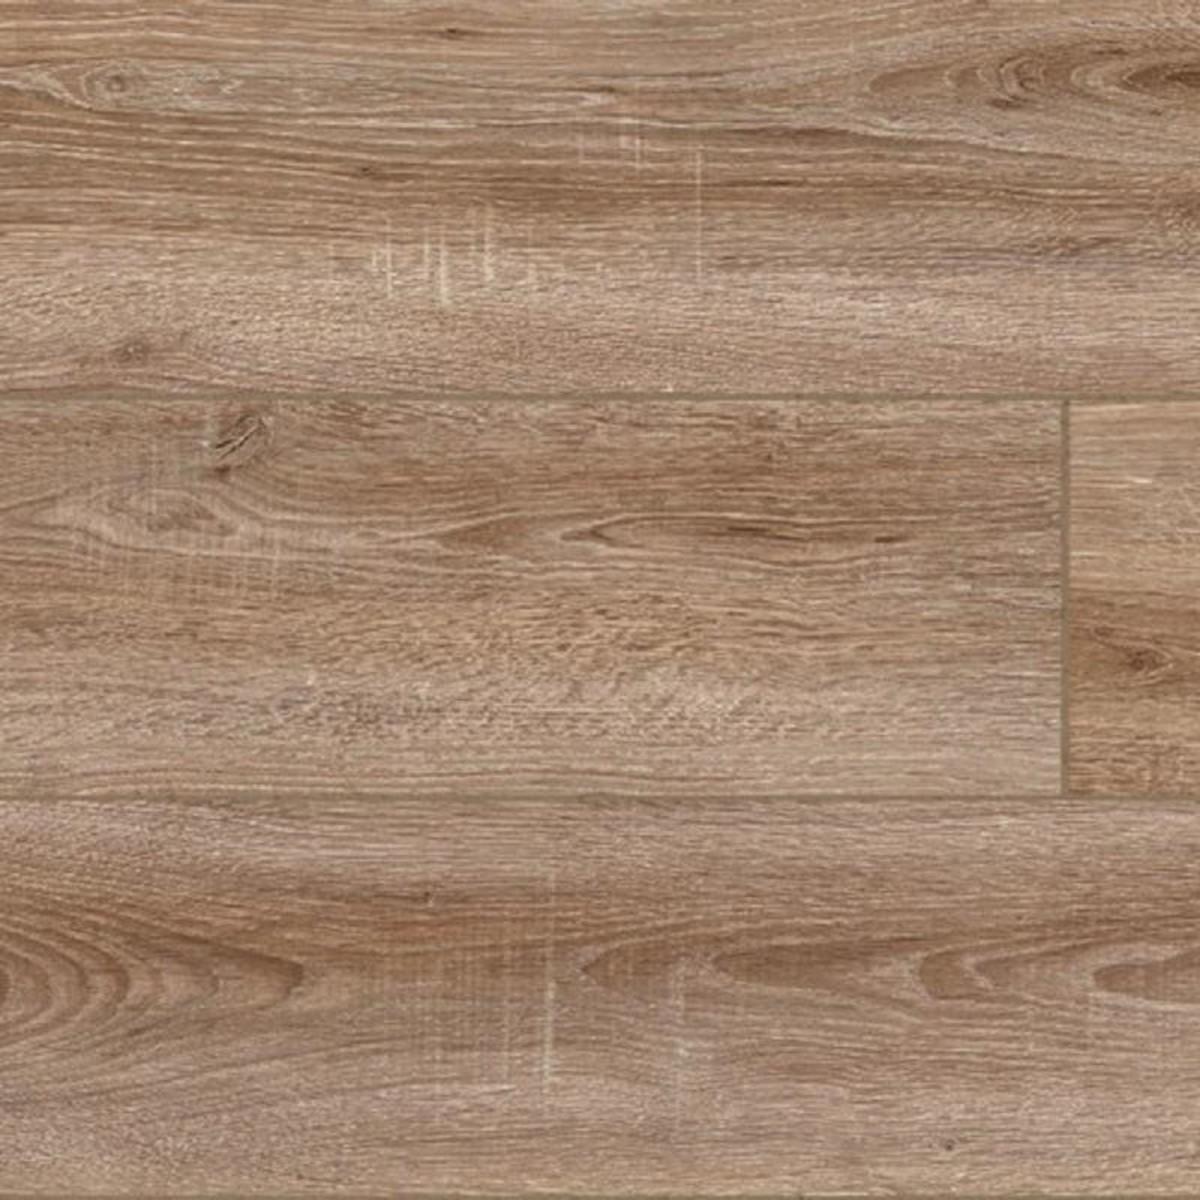 Ламинат Woodstyle Breeze 33 класс толщина 10 мм 2.156 м²